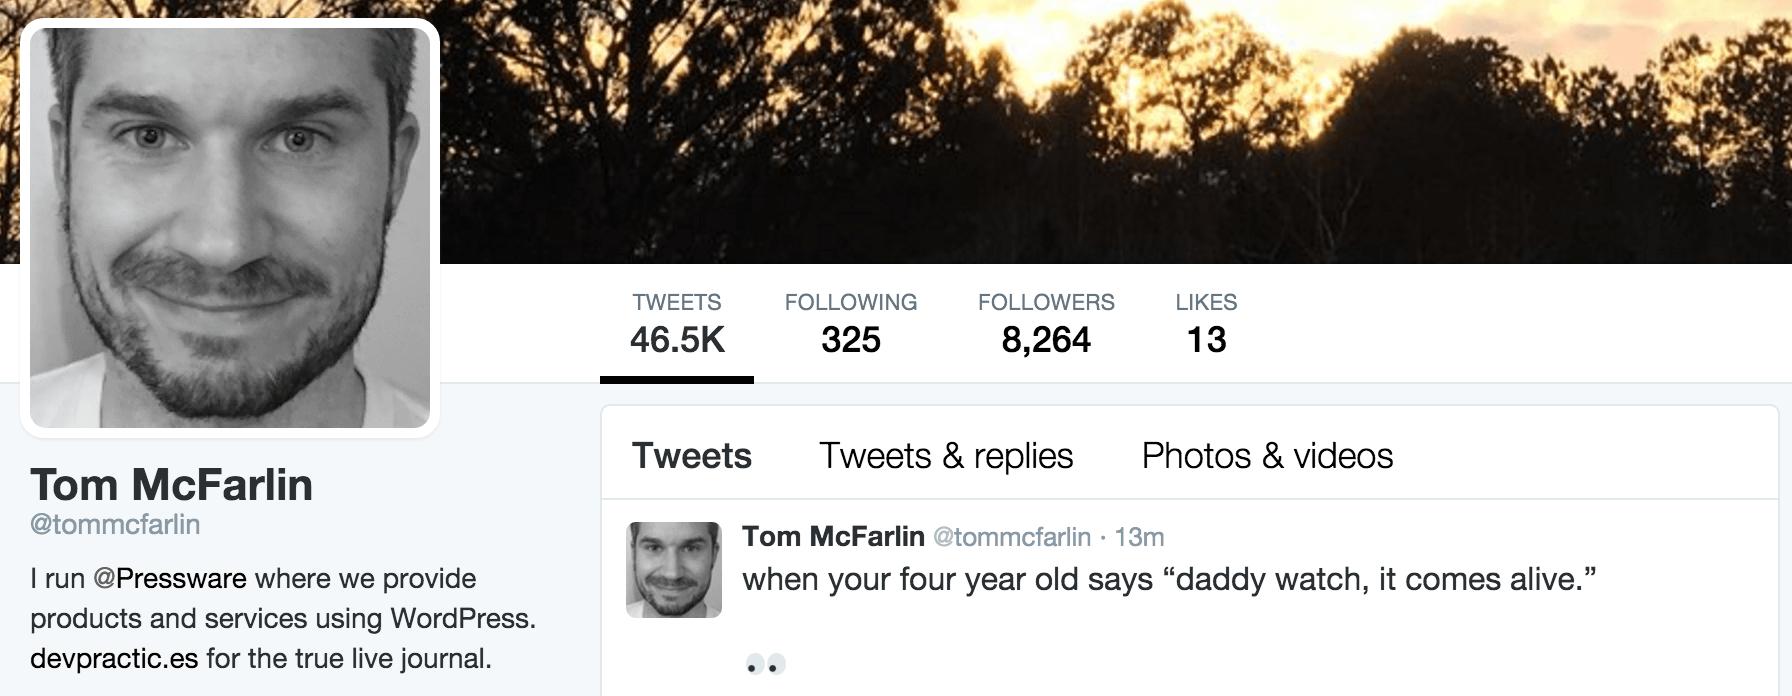 Tom McFarlin